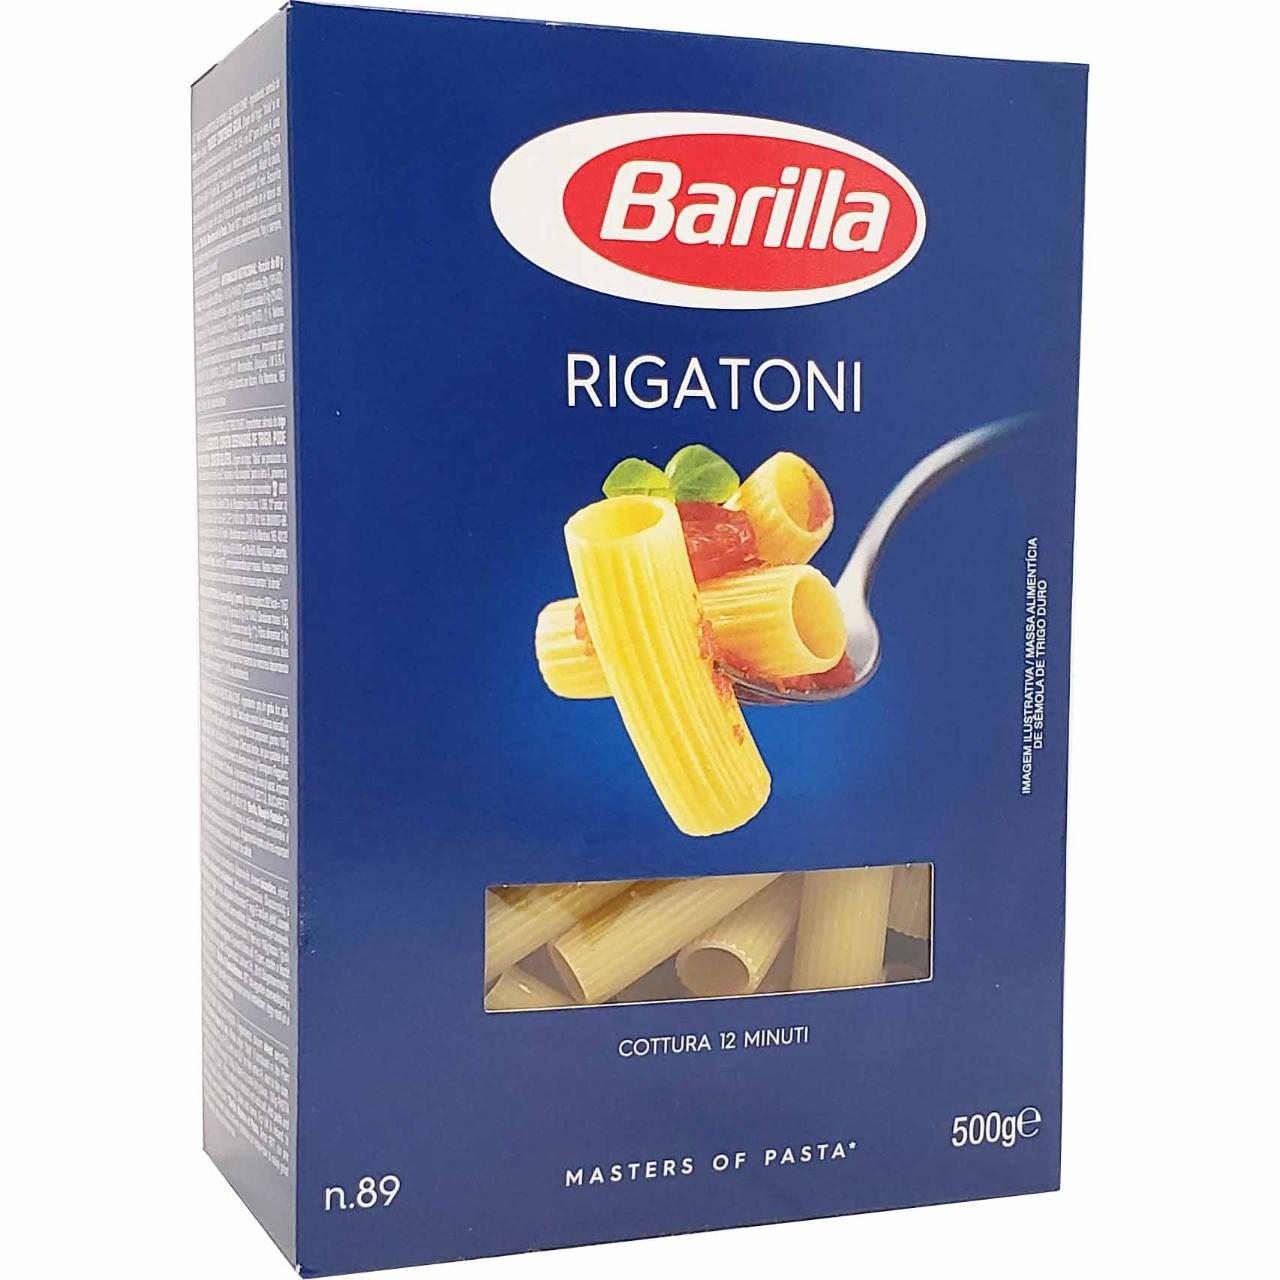 Macarrão Rigatoni Barilla - 500g -